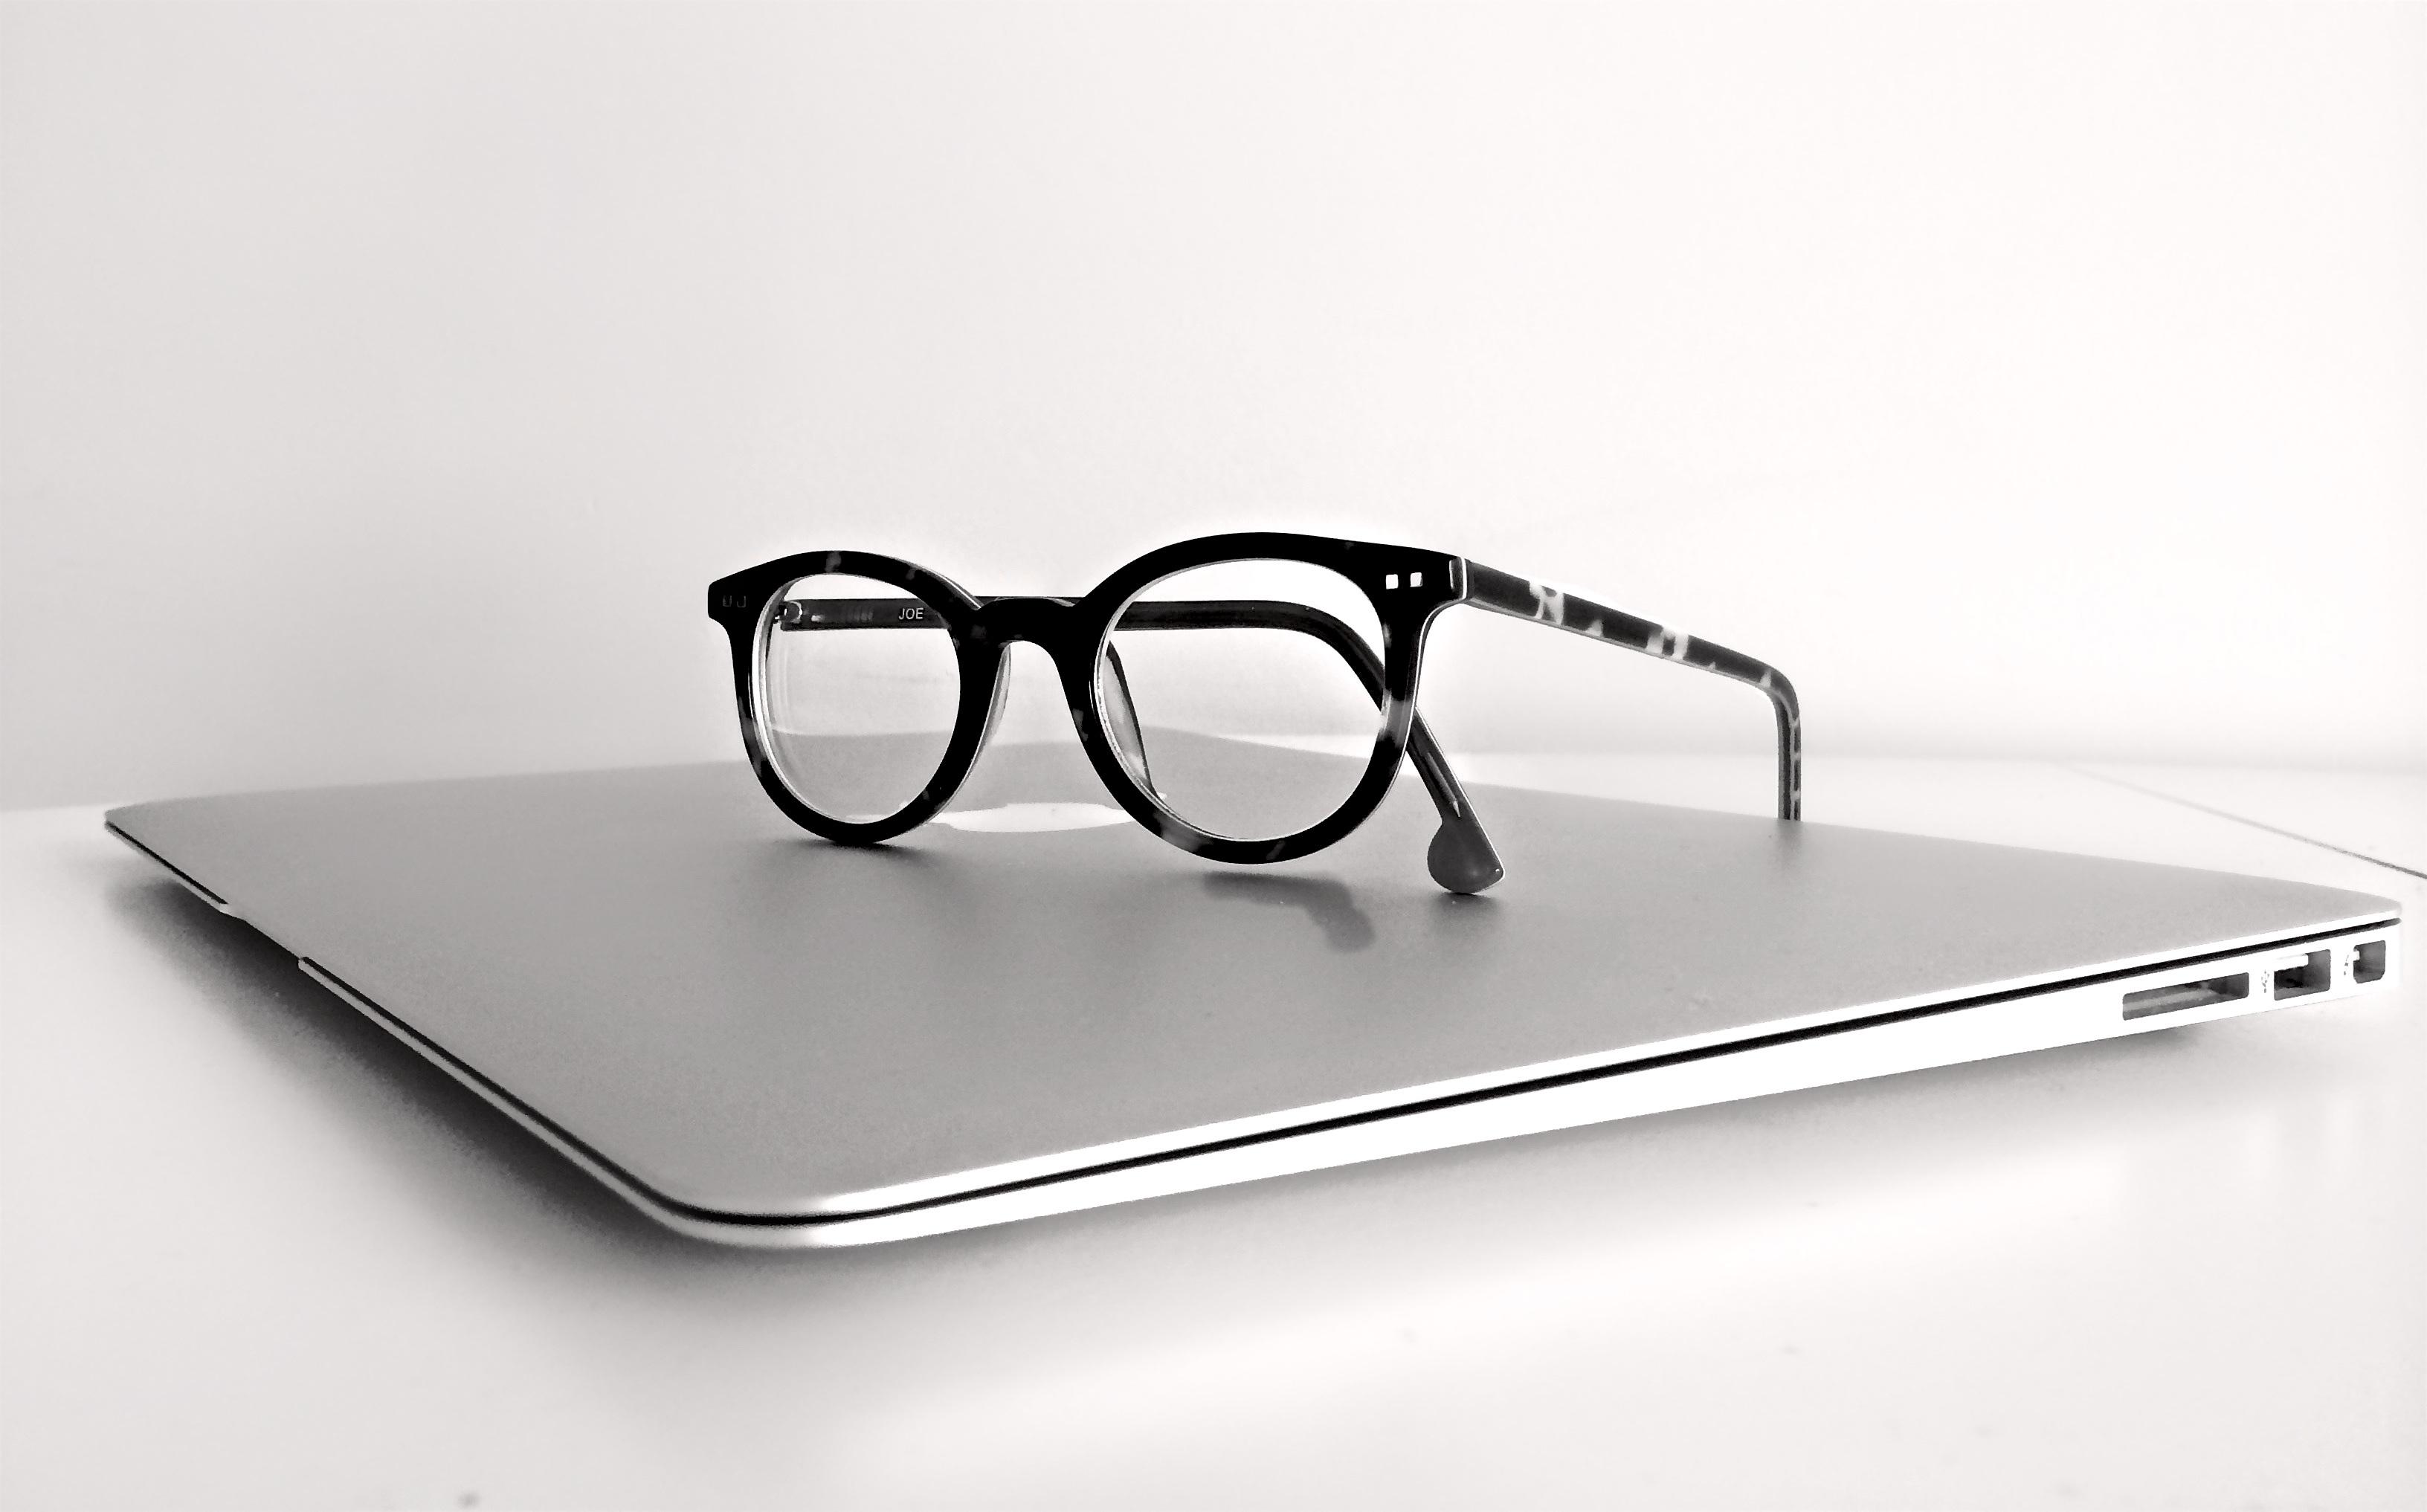 Free laptop puter macbook apple table technology